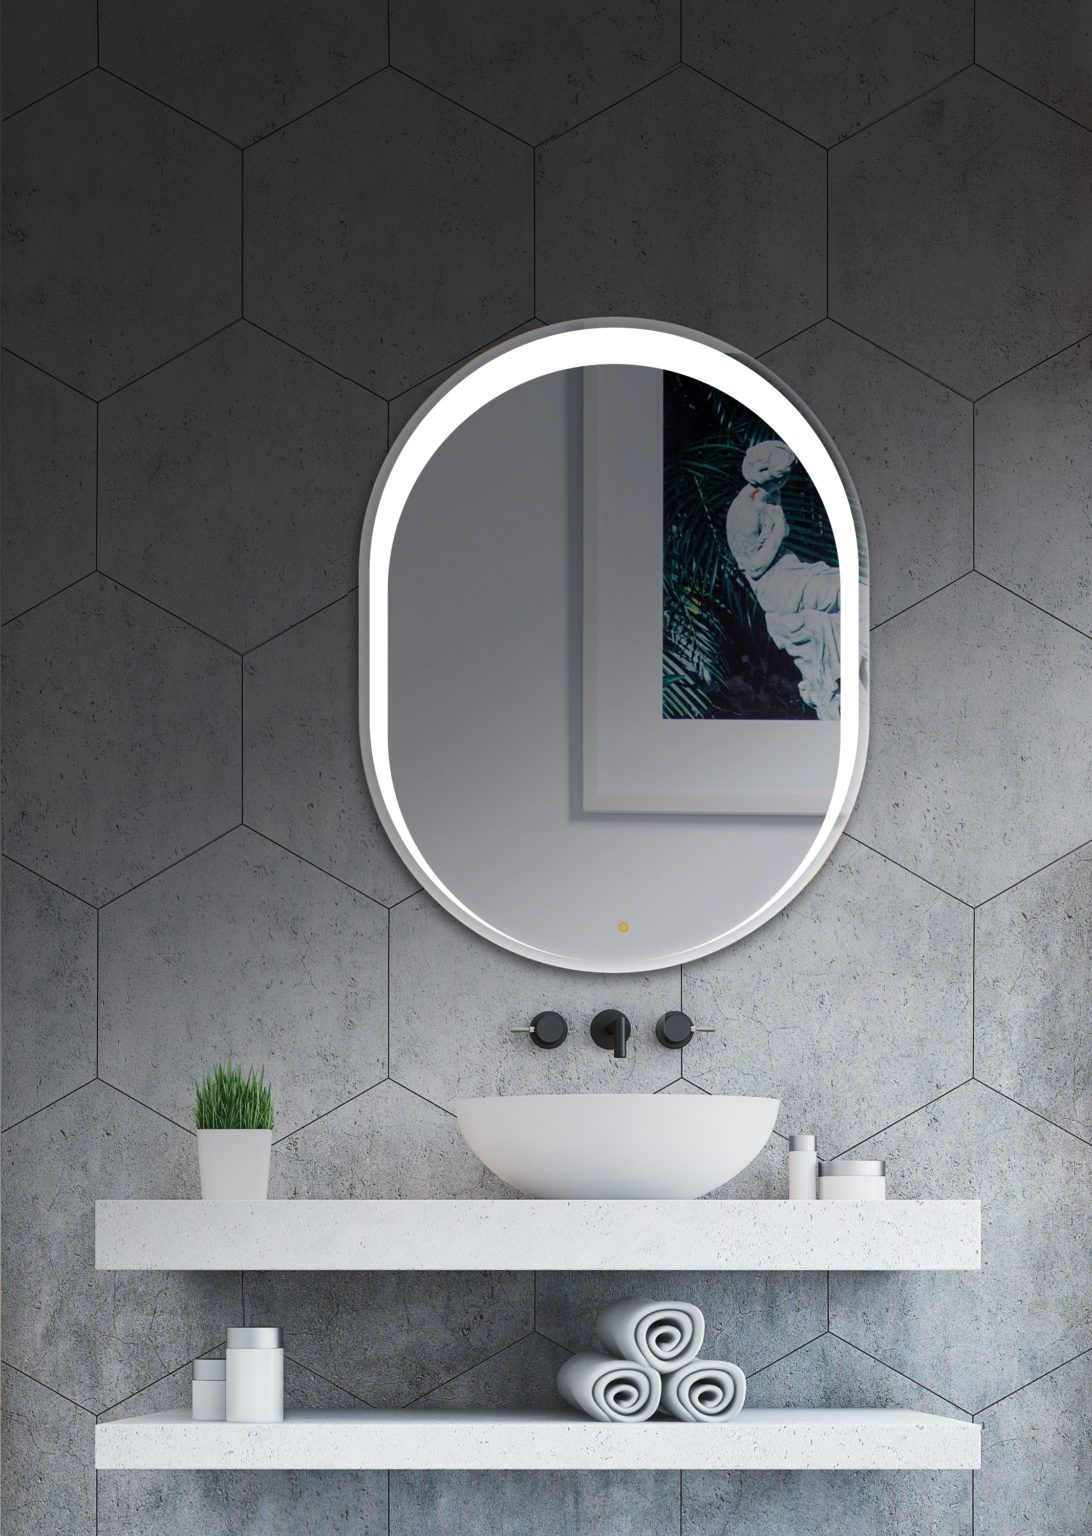 Espejo Bano Forma Oval Con Luz Led Frontal Retroiluminado Diseno